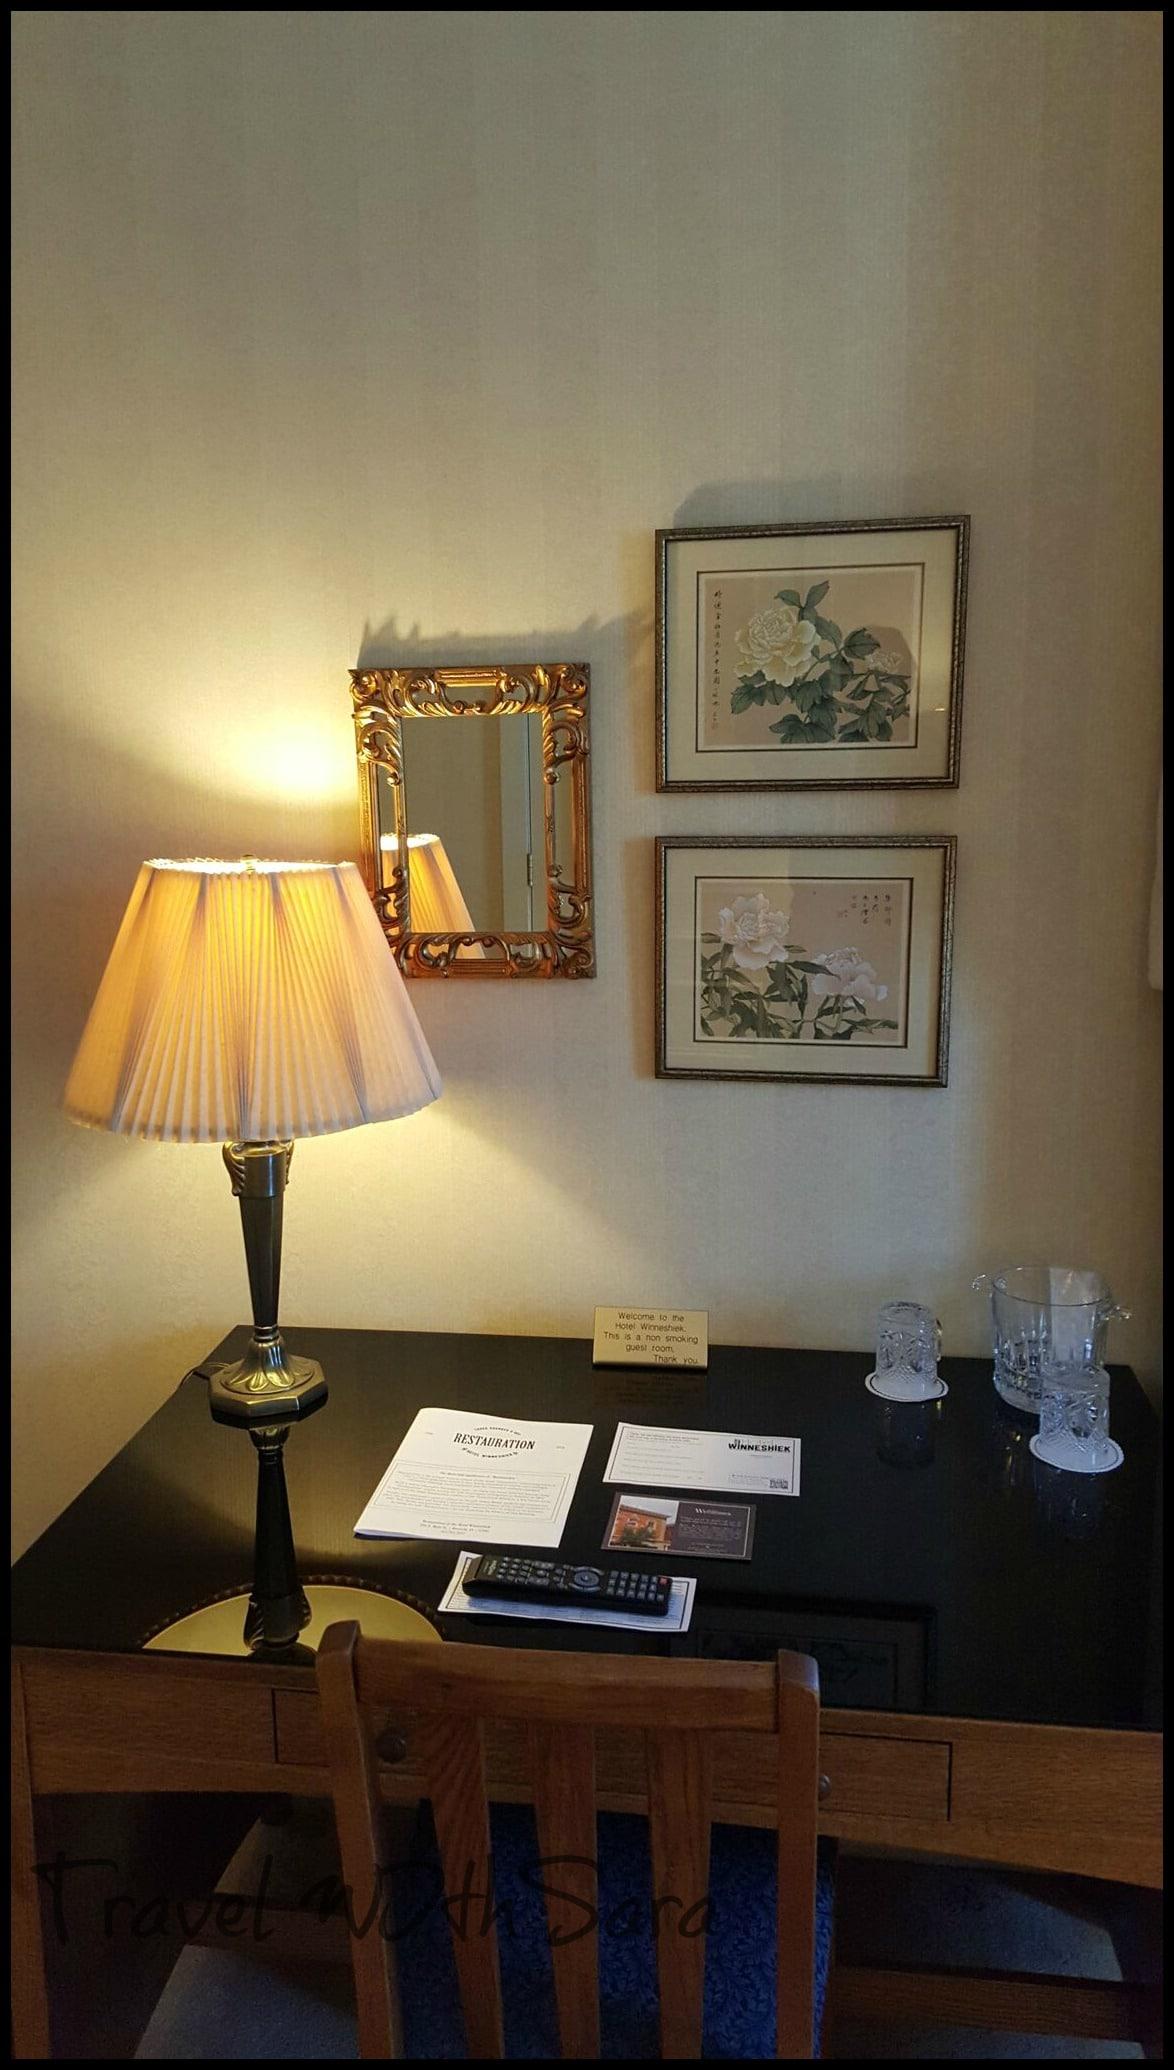 Charming hotel in decorah hotel winneshiek travel with sara for Charming hotel